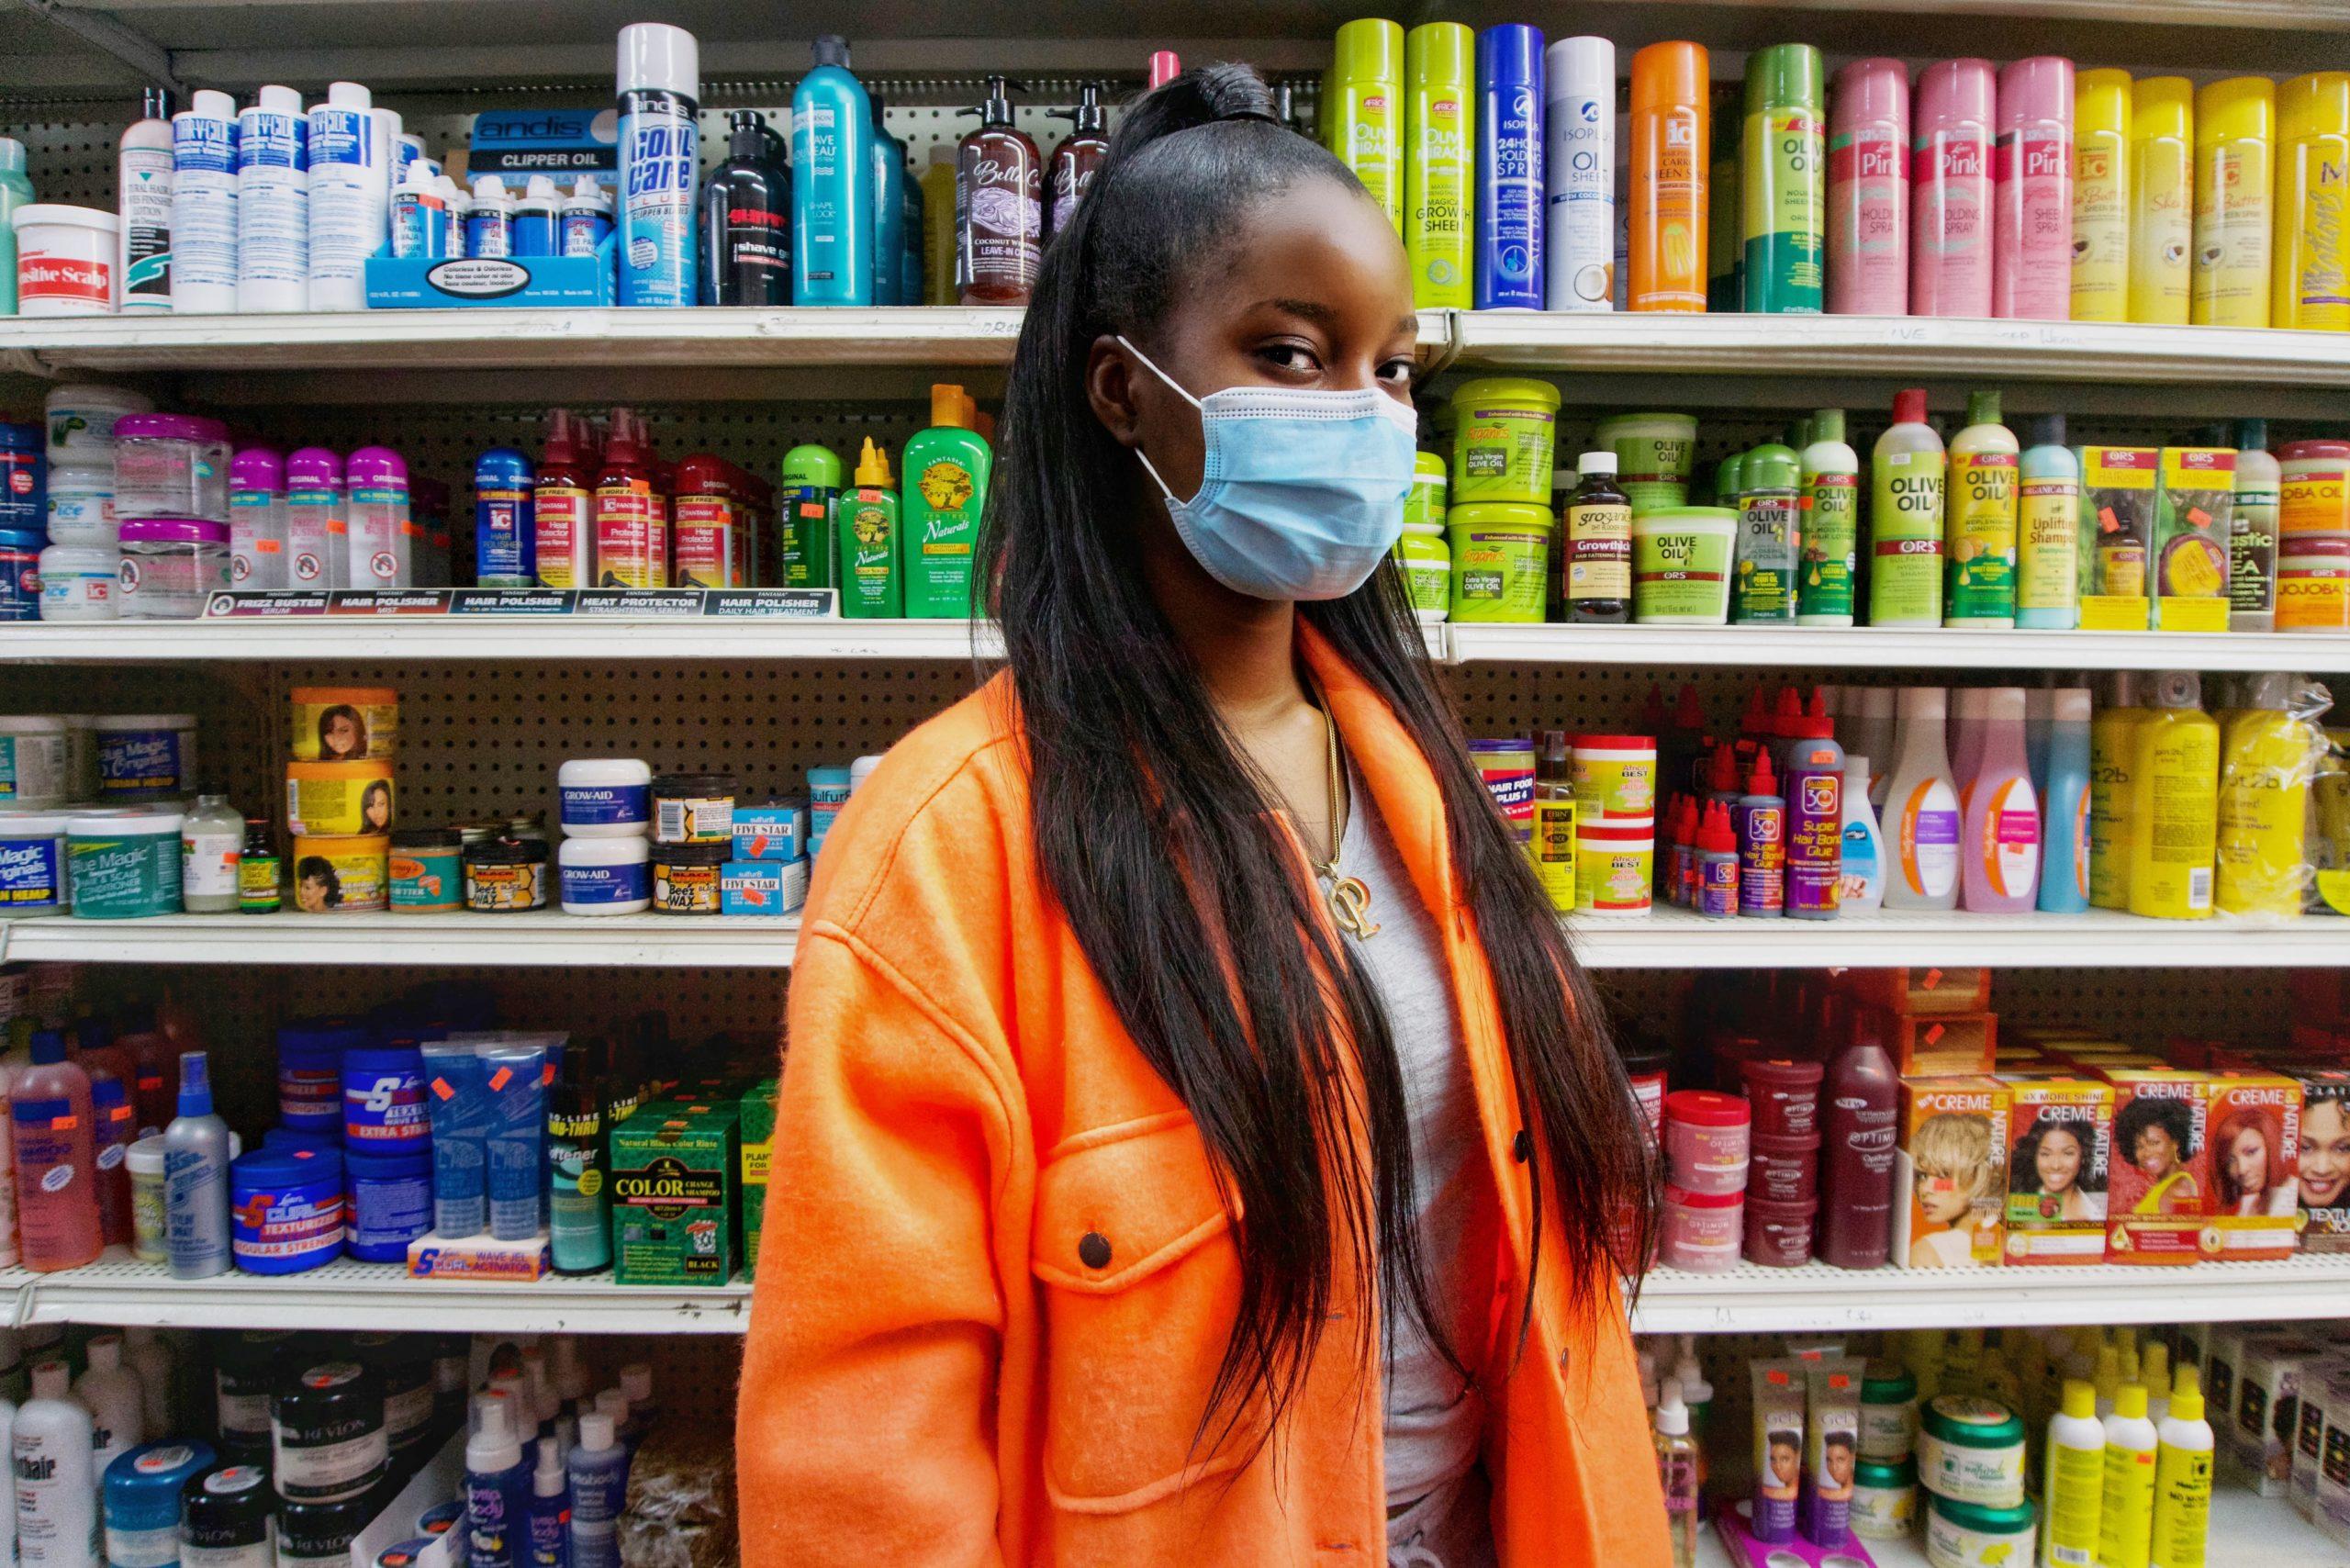 Meet Paris McKenzie, A 16-Year-Old Entrepreneur And Owner Of Paris Beauty Supplyz In Brooklyn